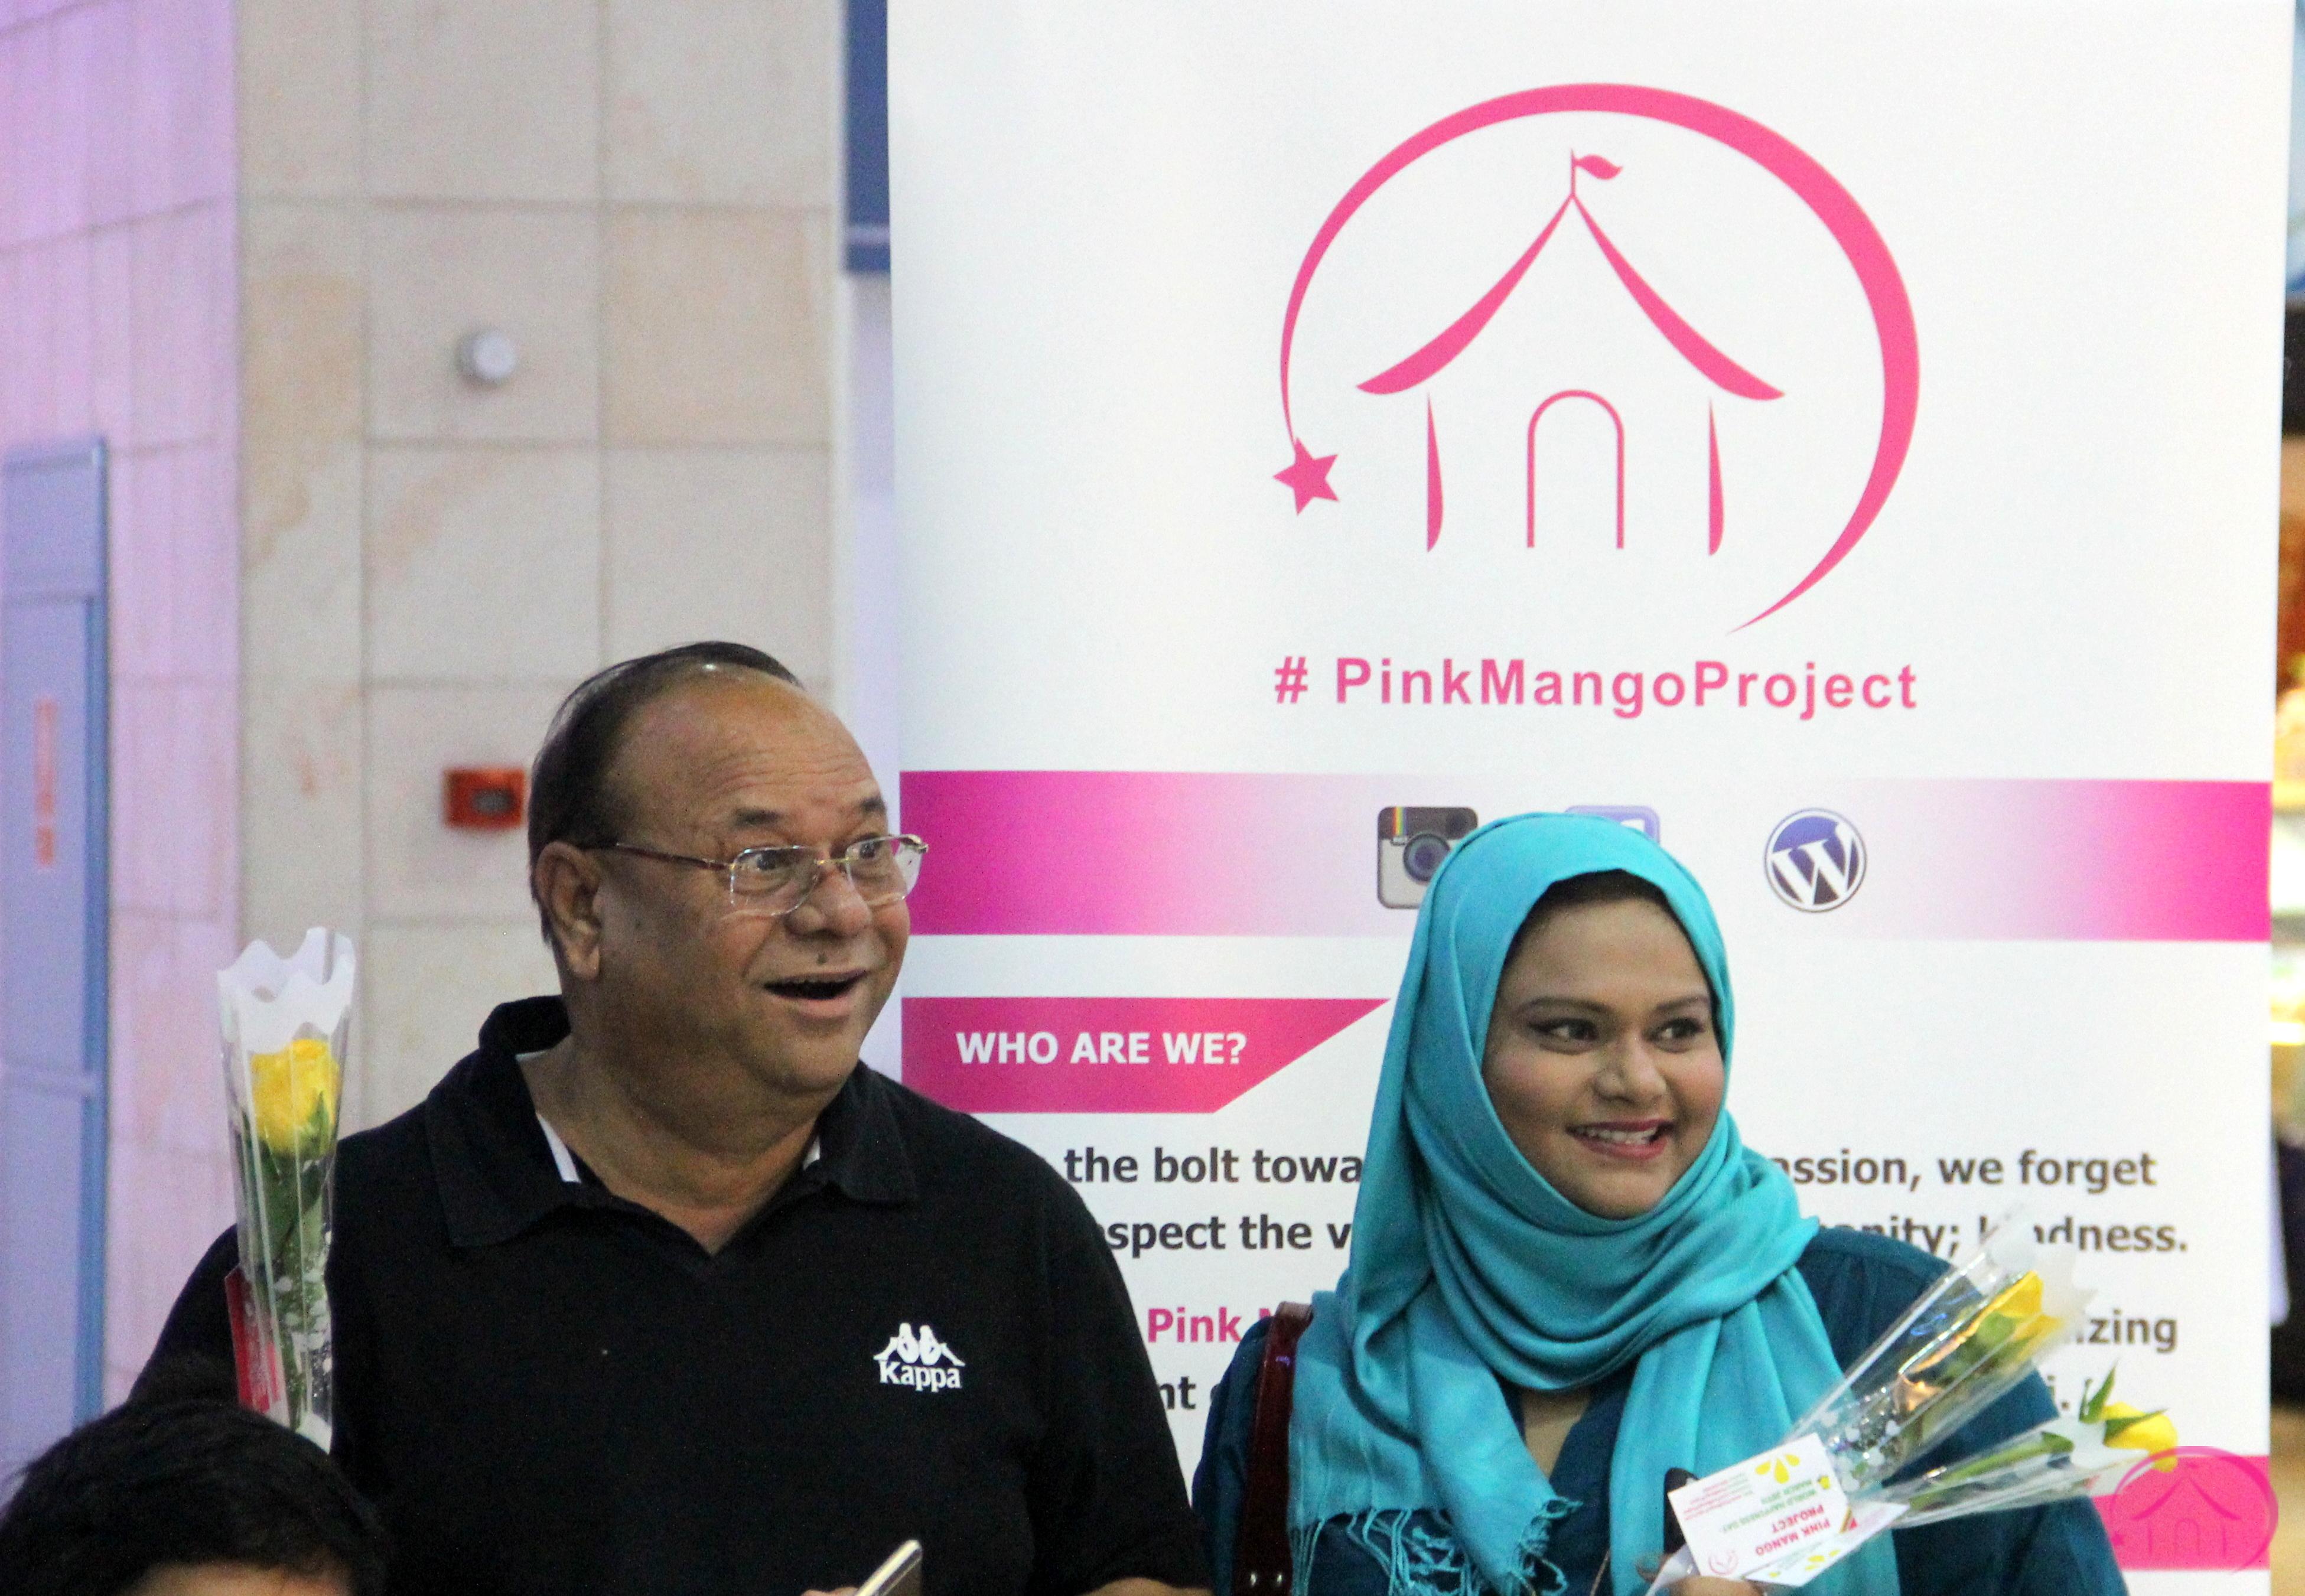 Pink Mango Project